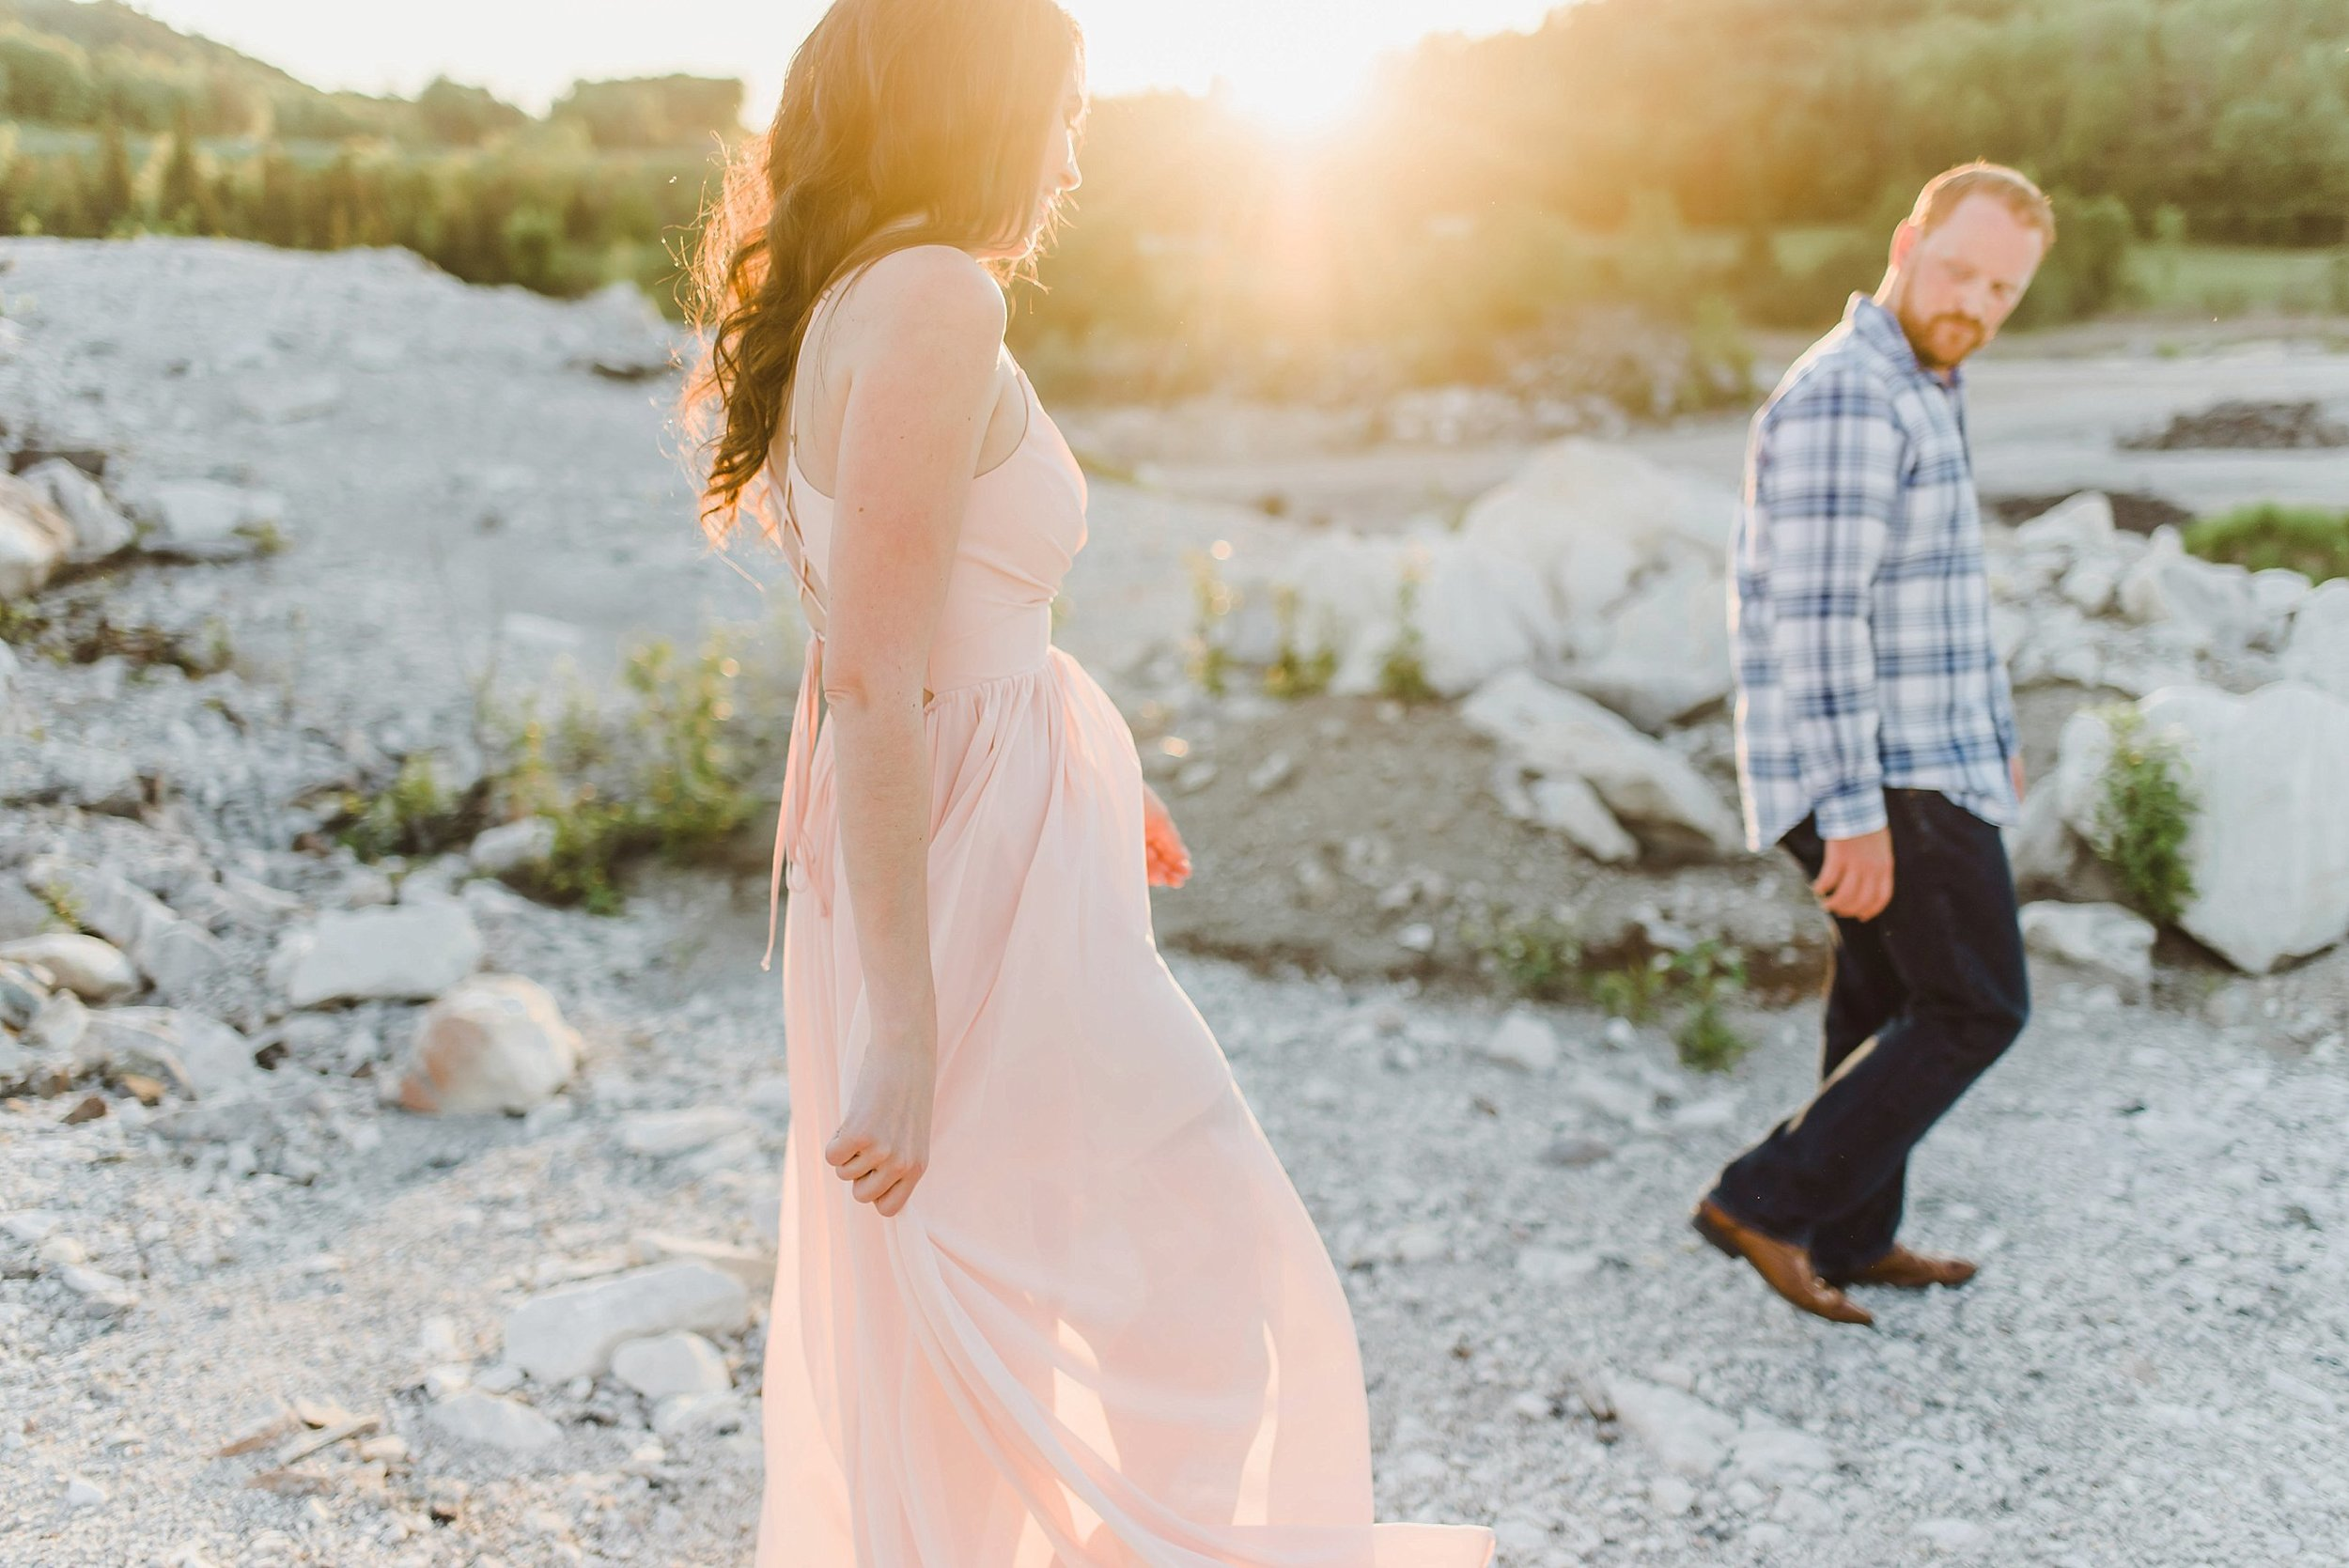 light airy indie fine art ottawa wedding photographer | Ali and Batoul Photography_0697.jpg